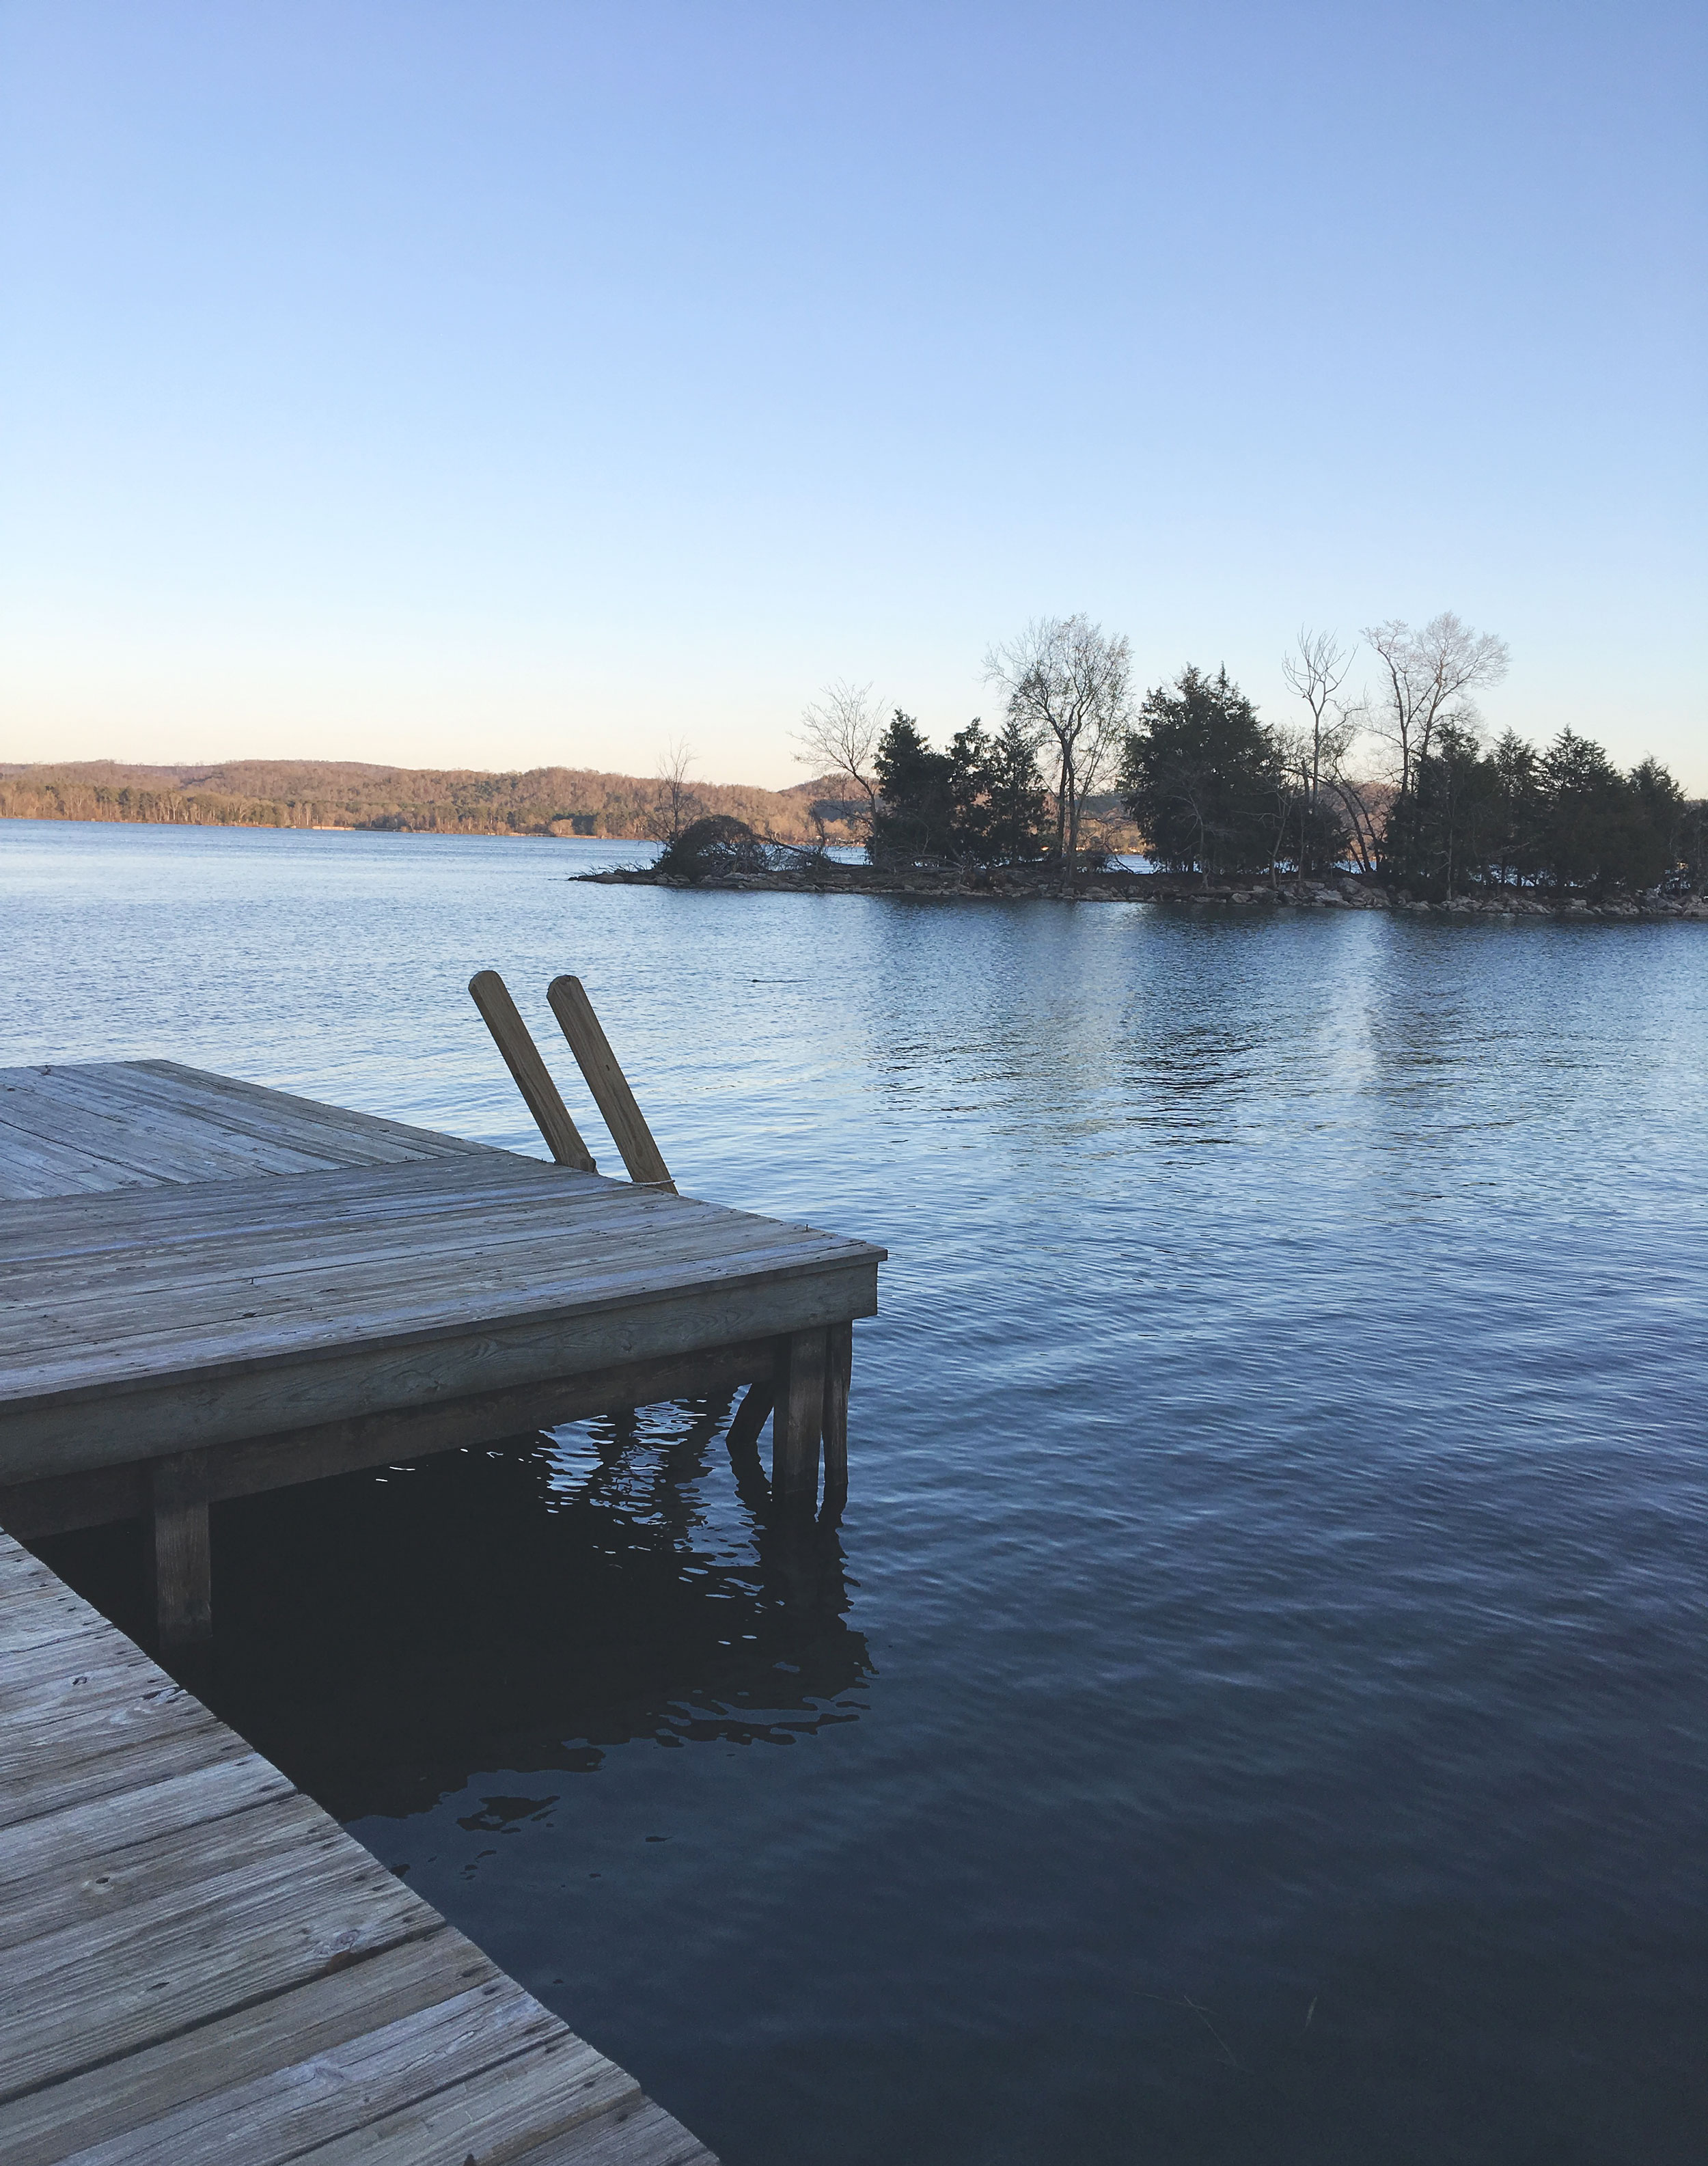 Dock at the lakehouse